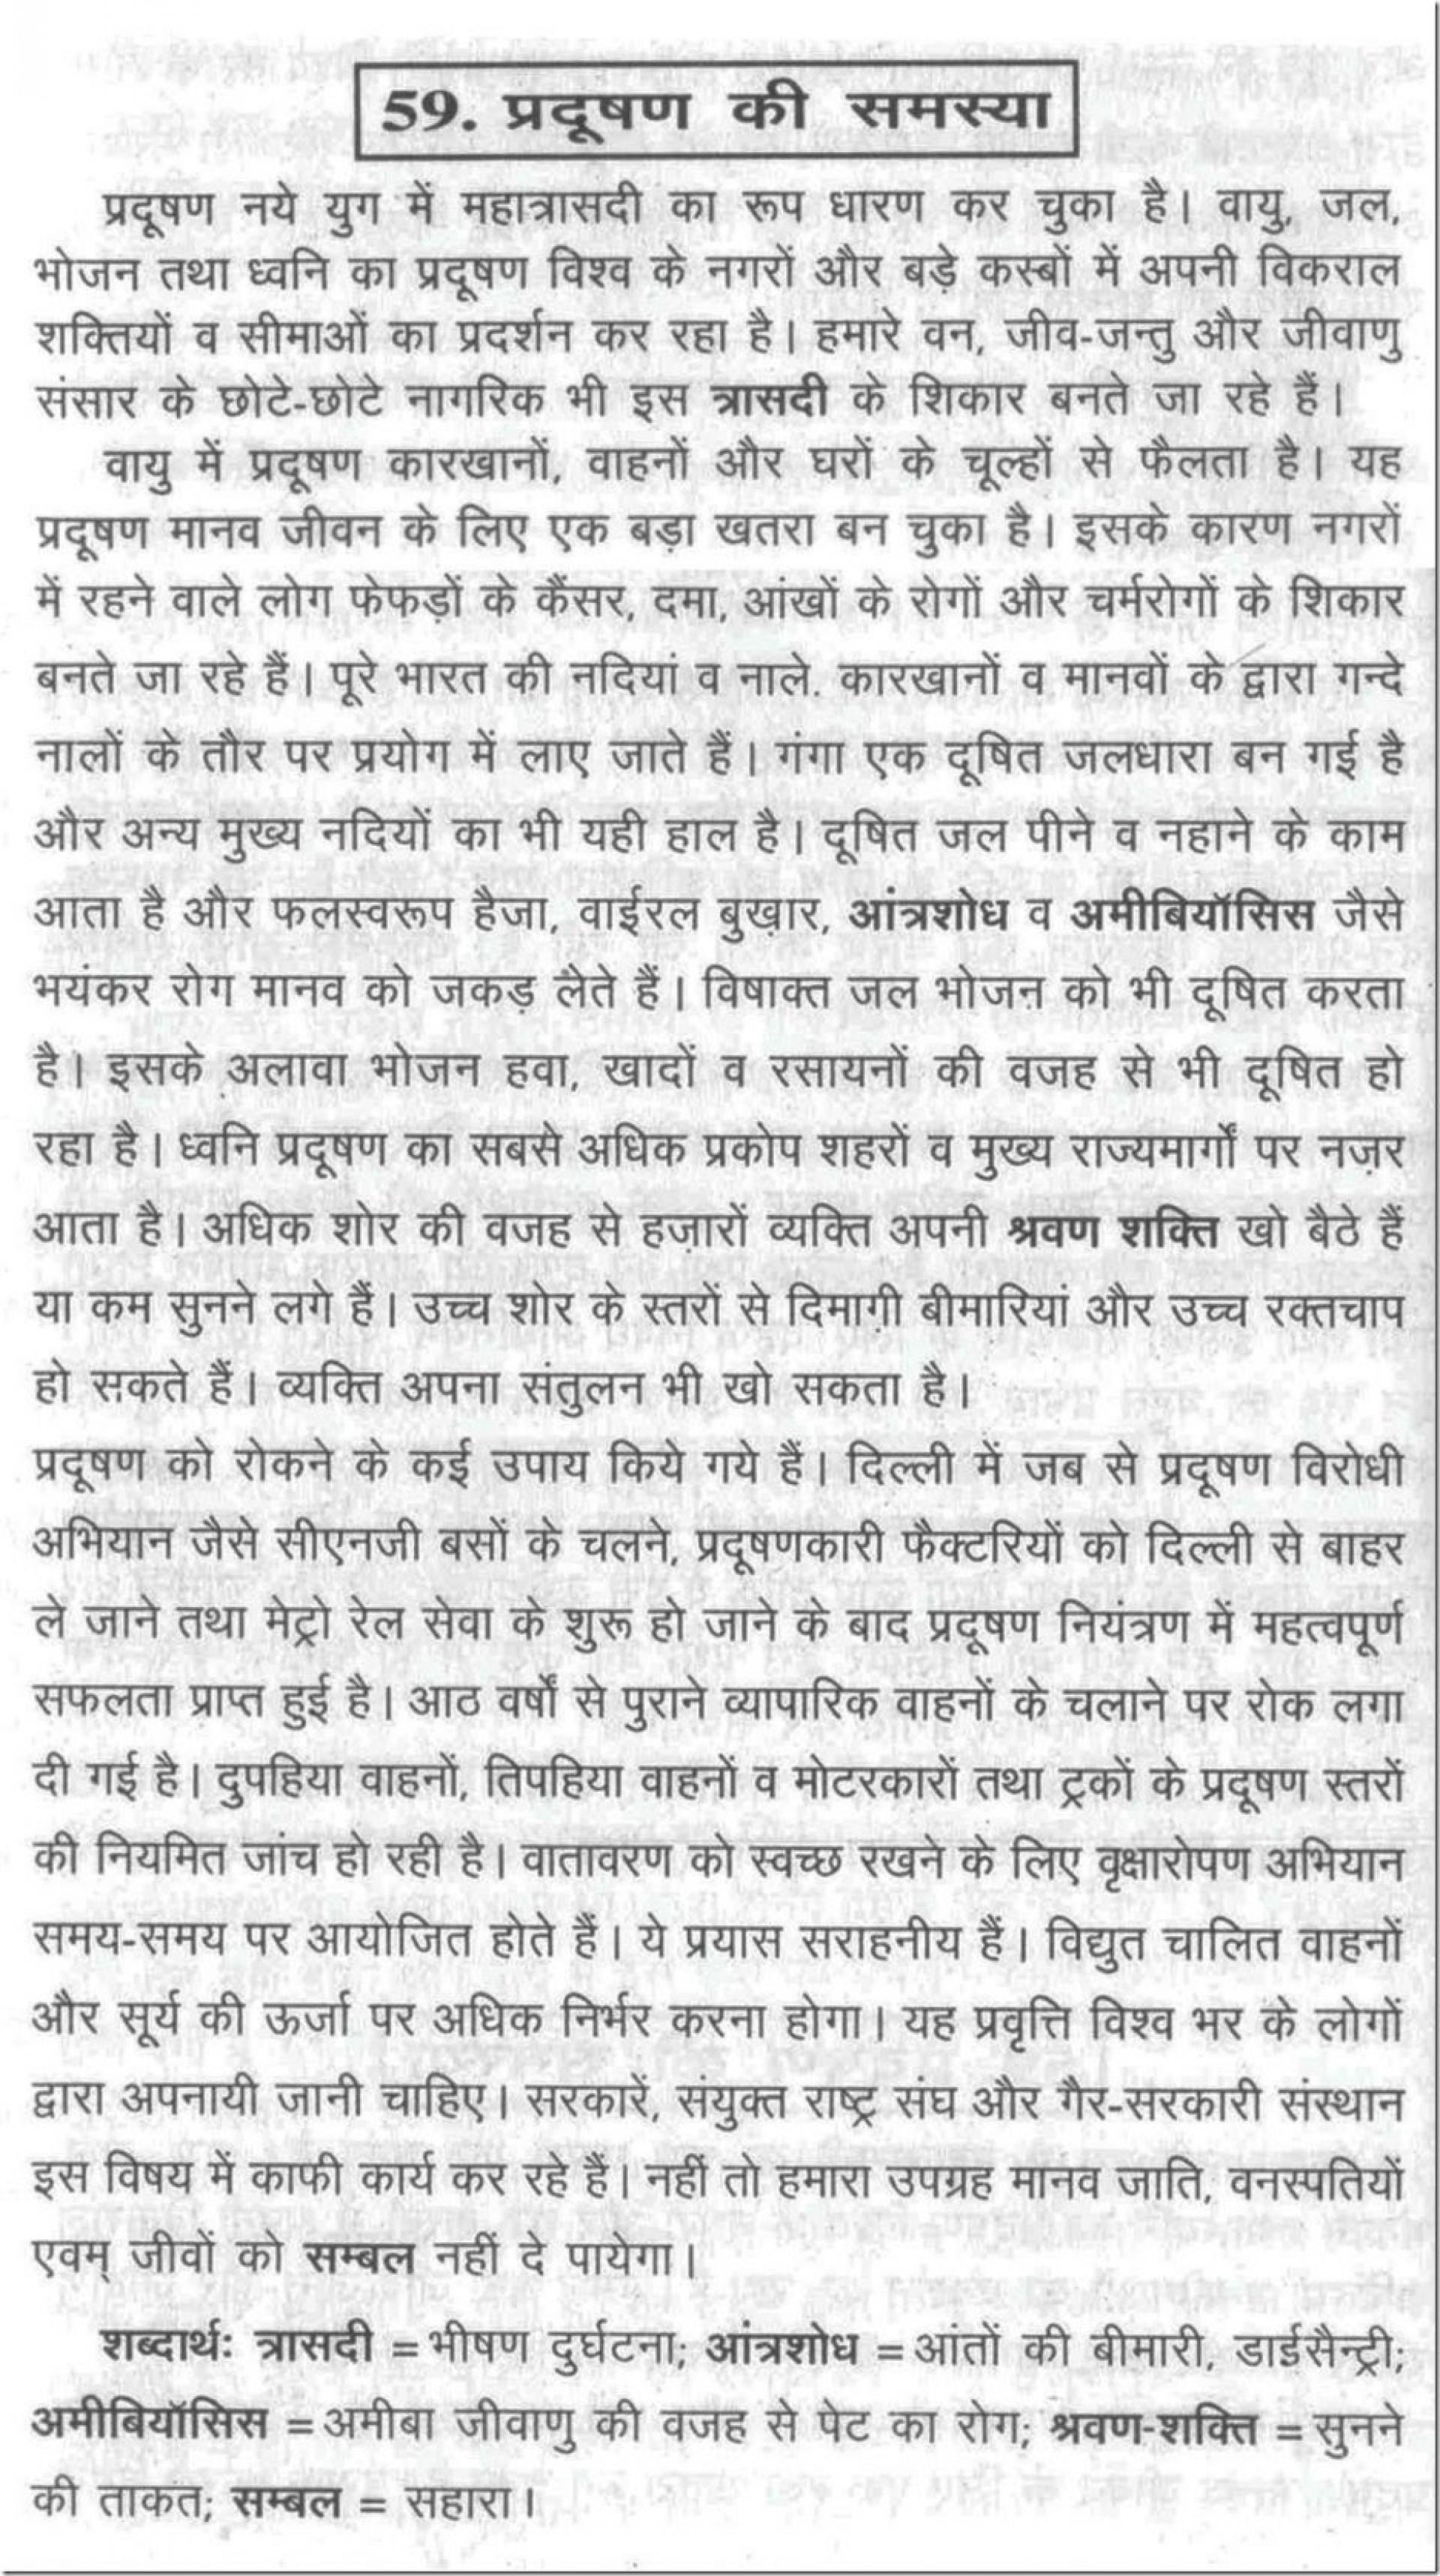 016 Essay Example Save Water Wikipedia Thumb Essays On In Hindi Language Marathi Punjabi For Class And Electricity Awful Life Tamil Gujarati 1920